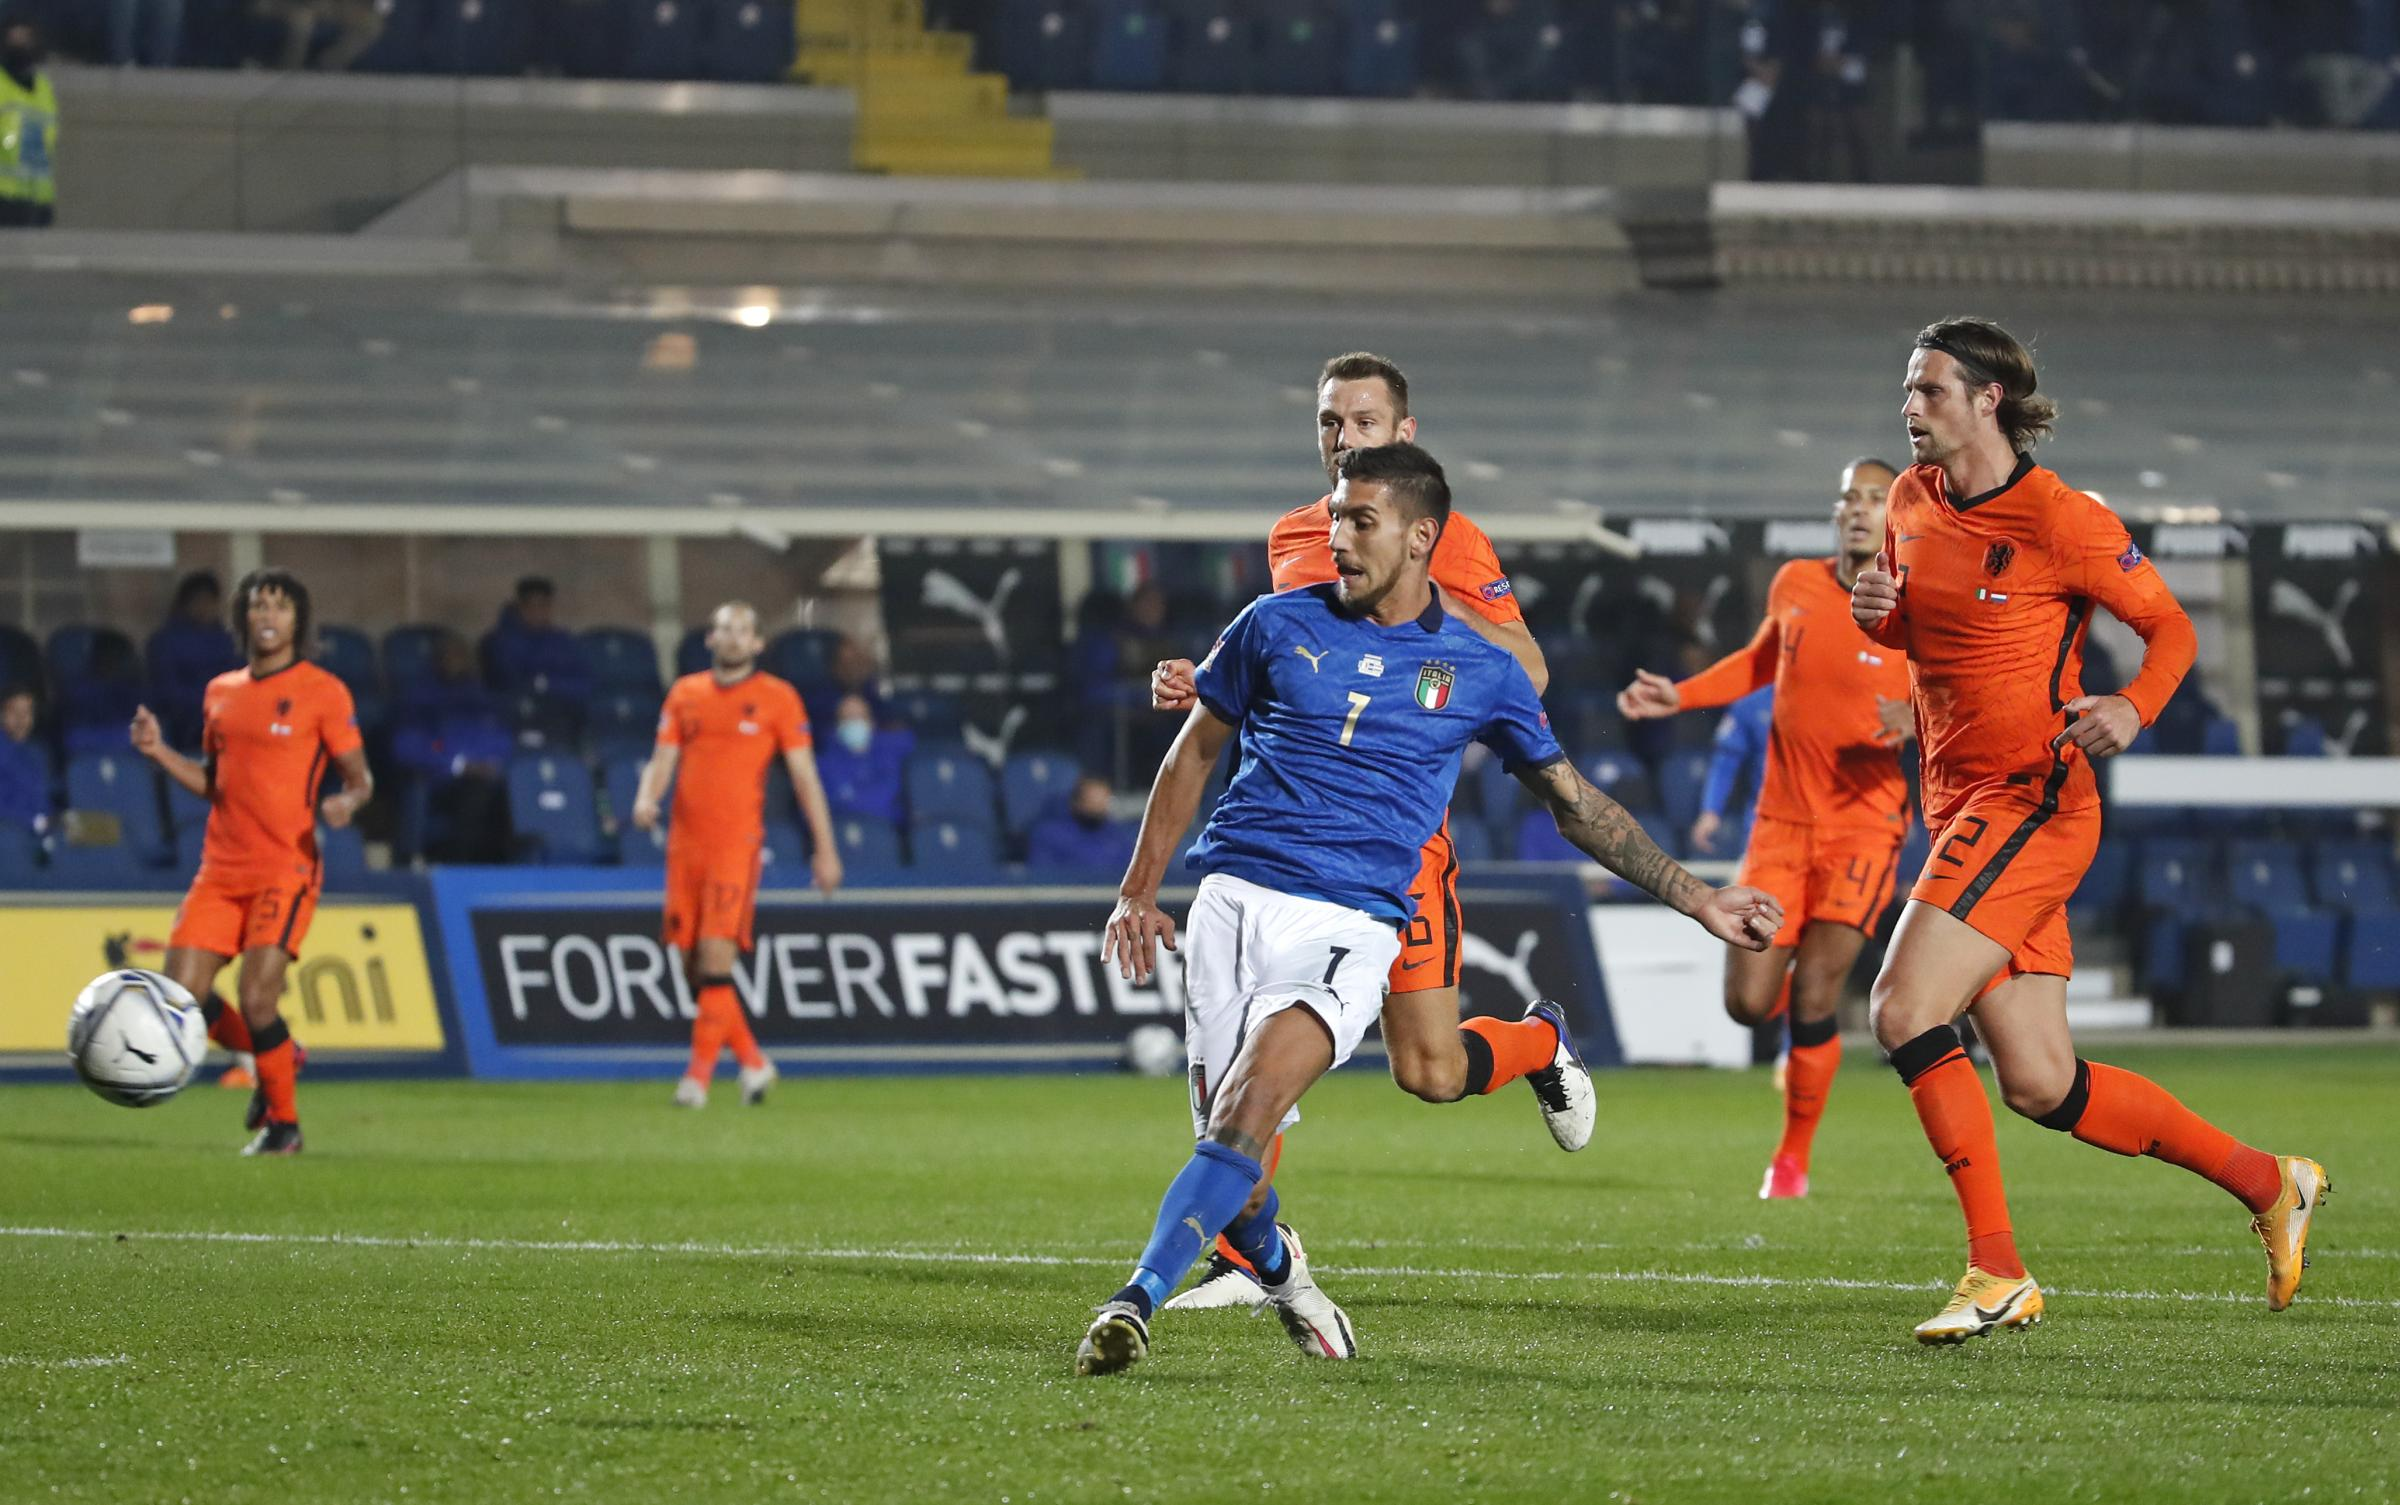 Nations League 2021. Italia-Olanda 1-1, le OA Pagelle. Barella e F. De Jong superlativi, stecca Immobile